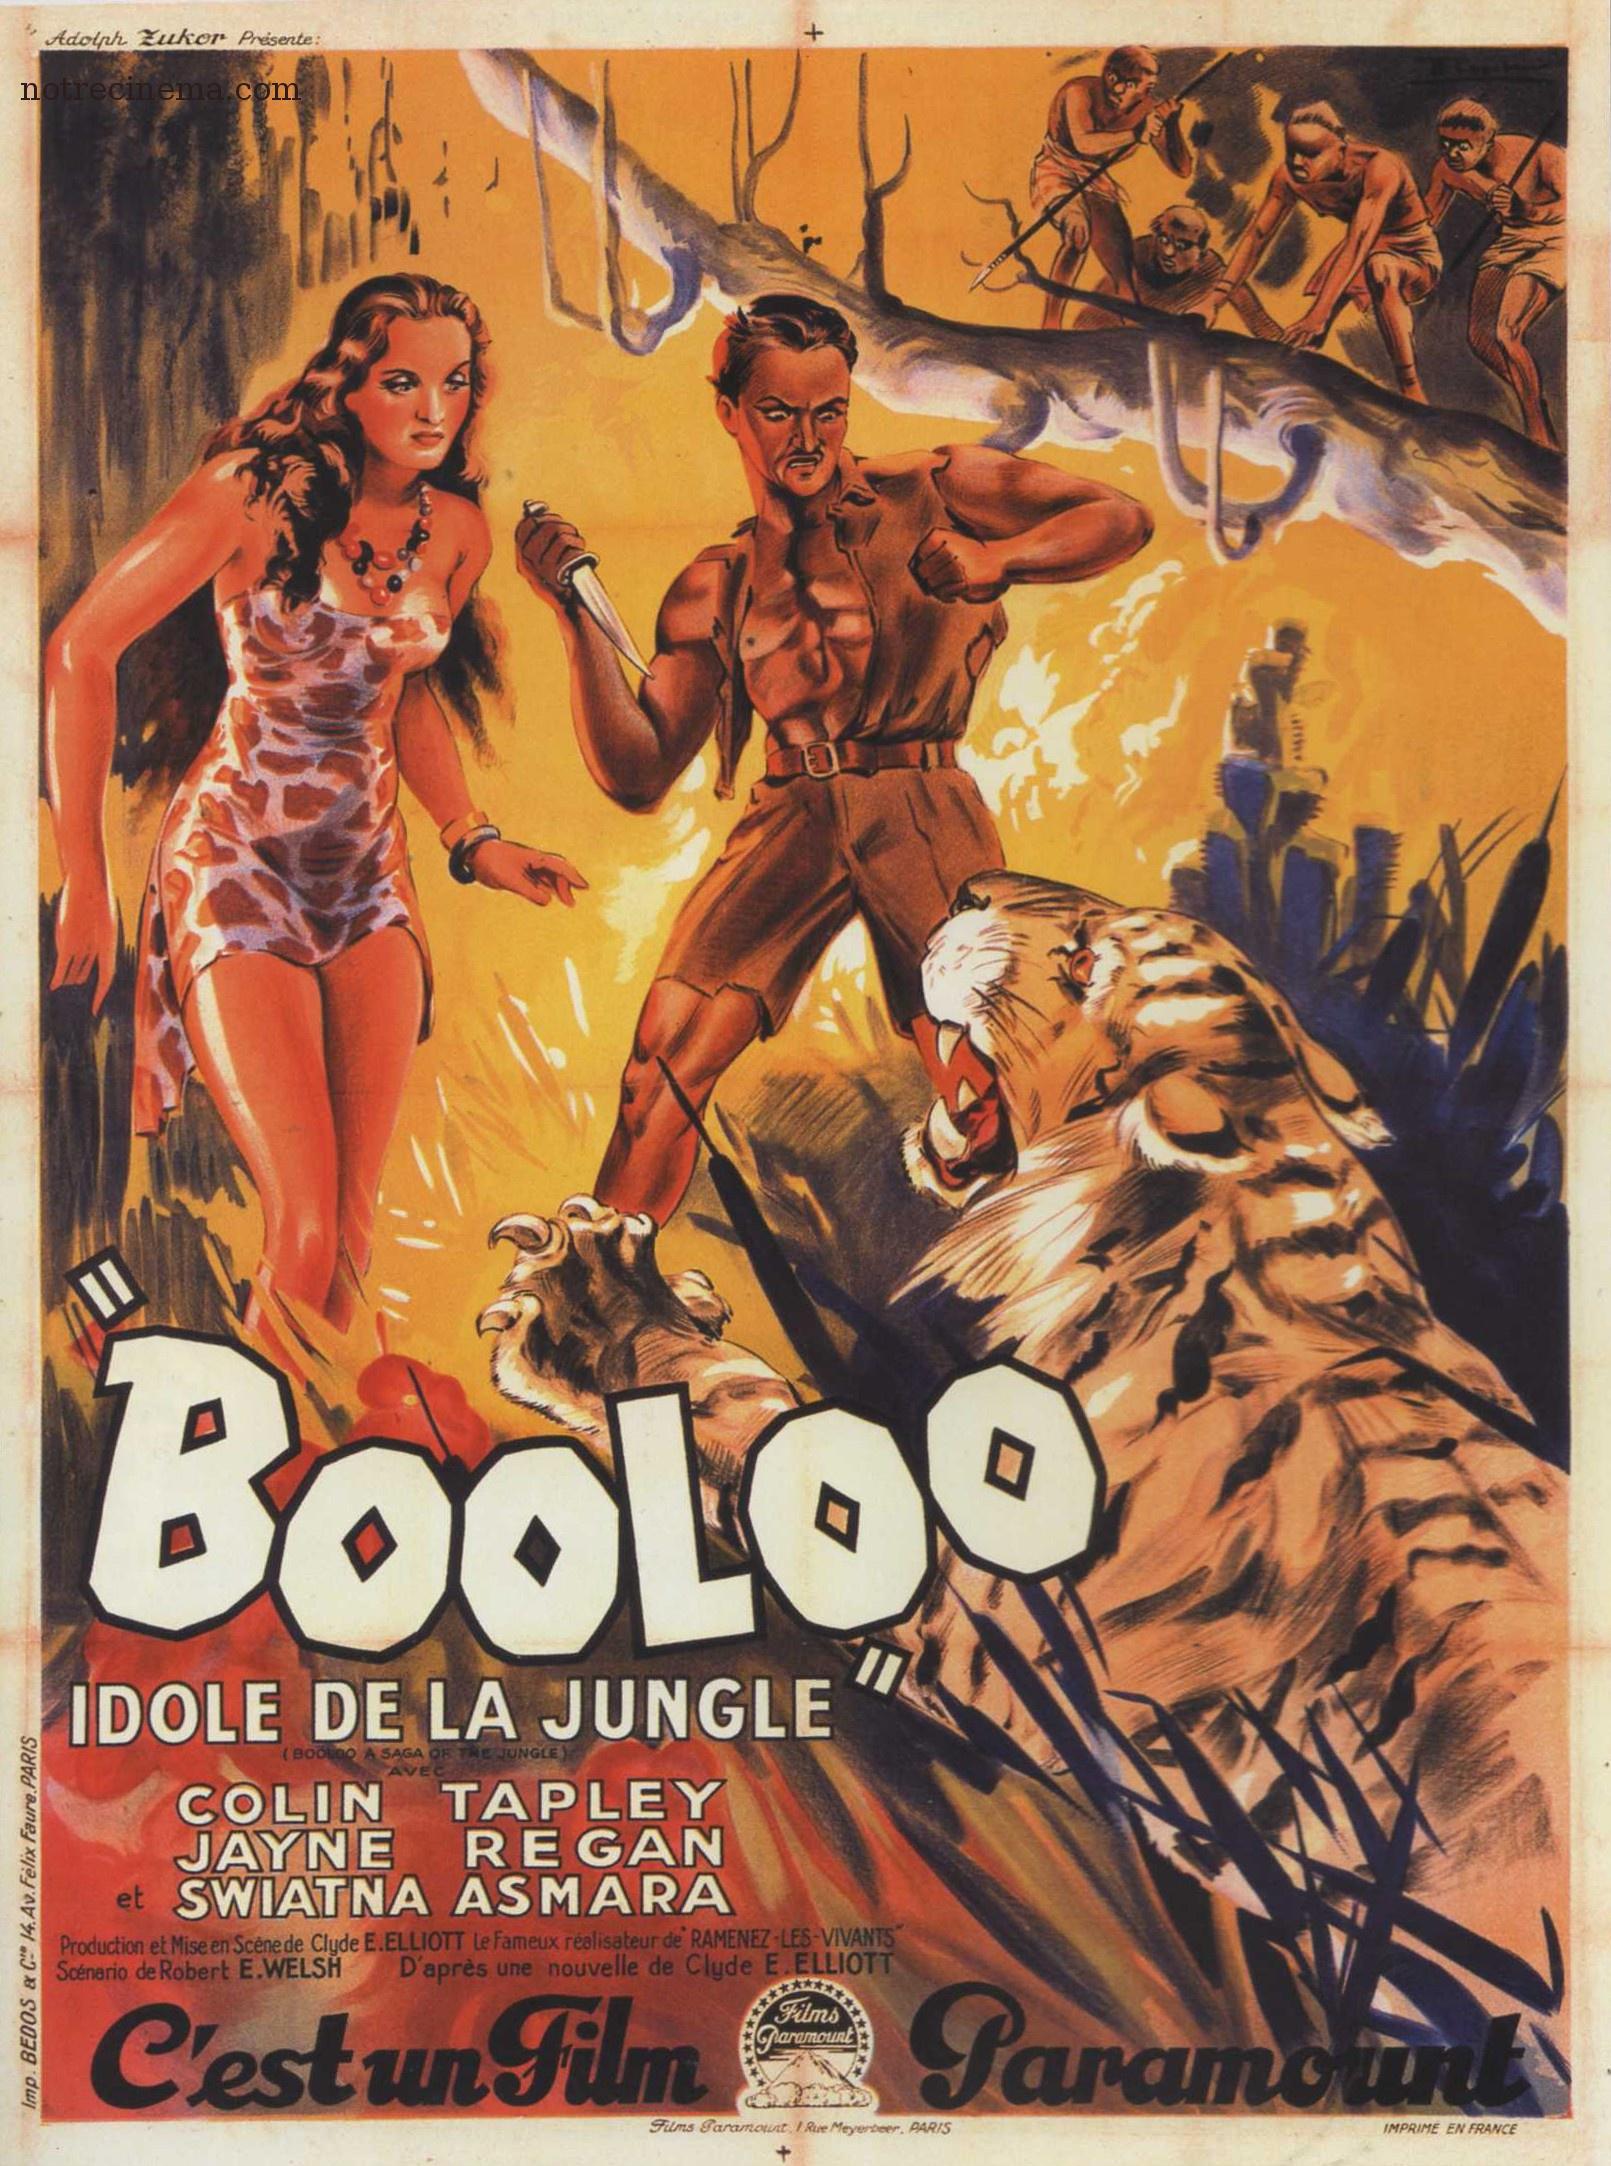 Booloo (1938) - C@rtelesmix